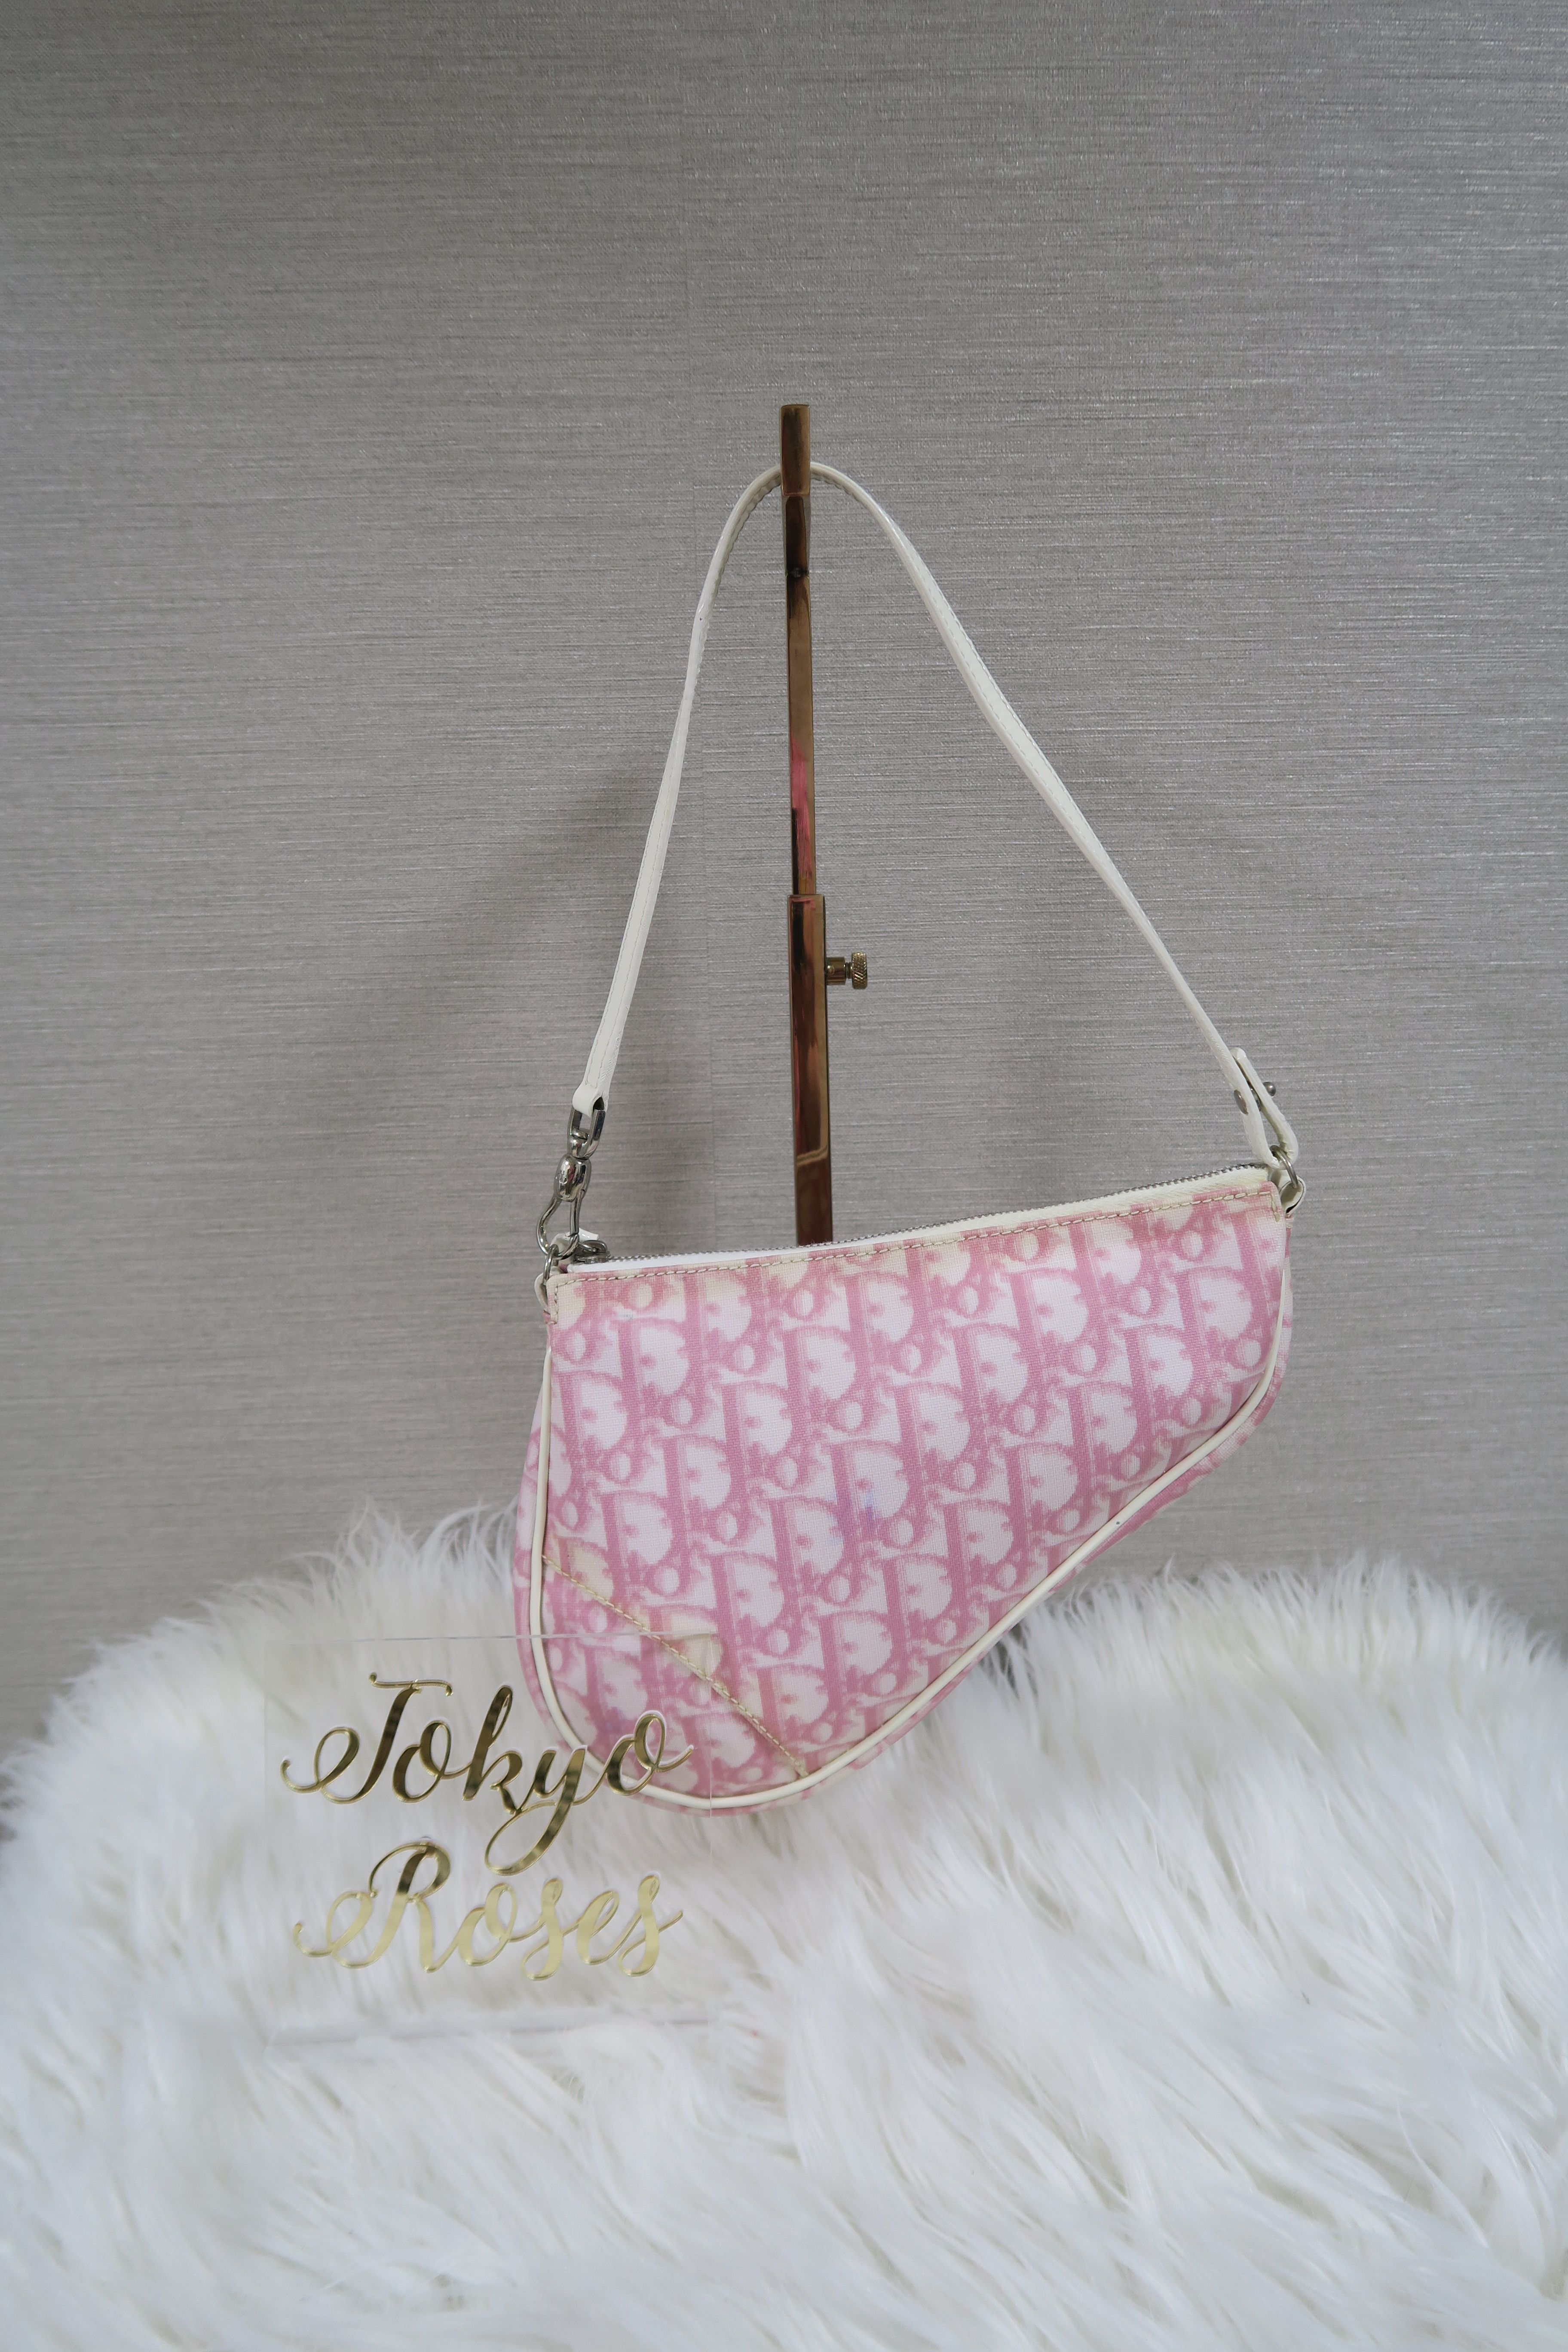 c070c37e8bb507 Christian Dior Trotter Monogram Print Saddle Bag Pink & White 1 ...